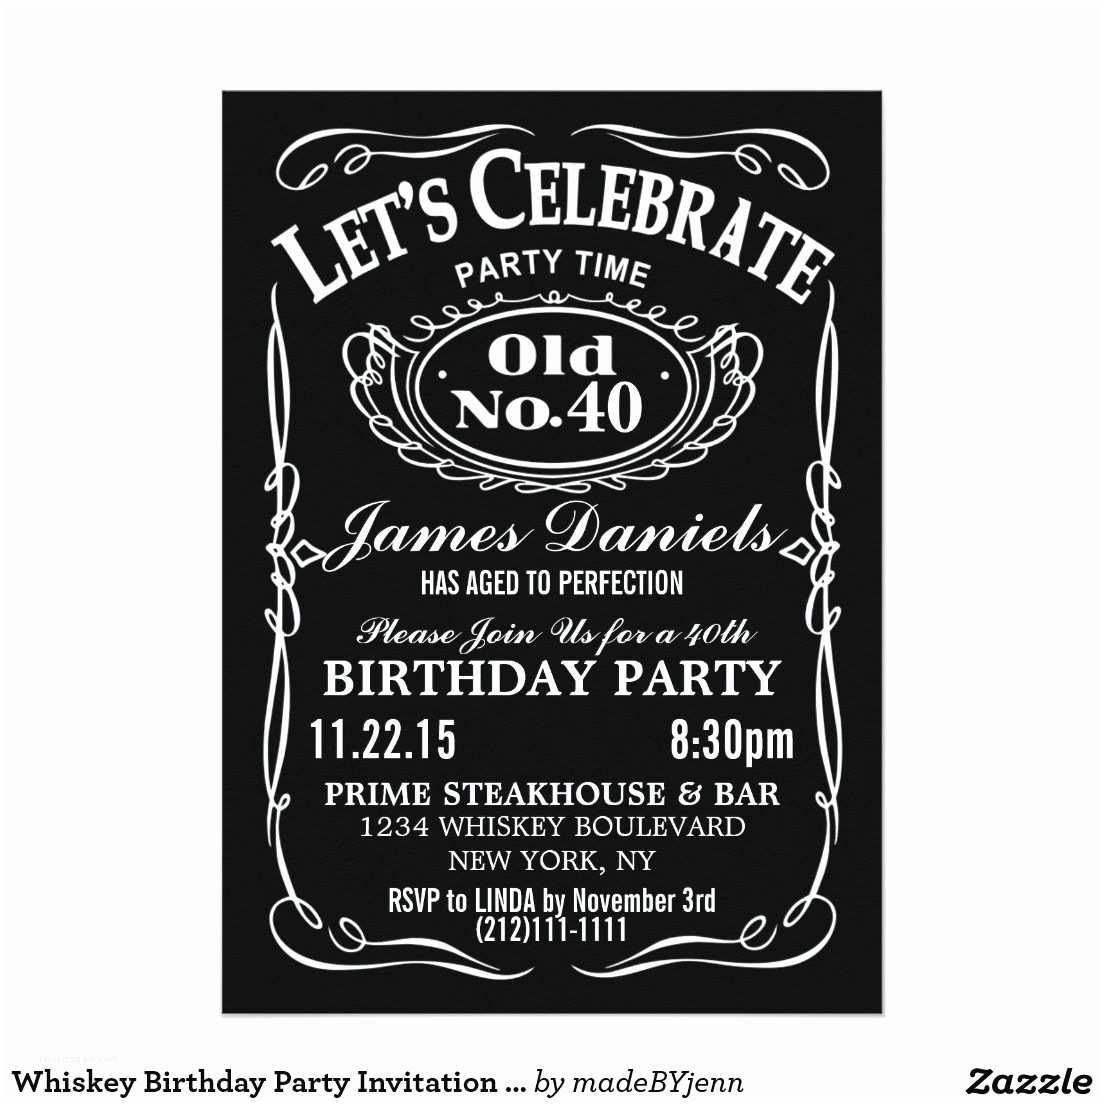 Jack Daniels Wedding Invitations Jack Daniels Whiskey Birthday Party Invitation